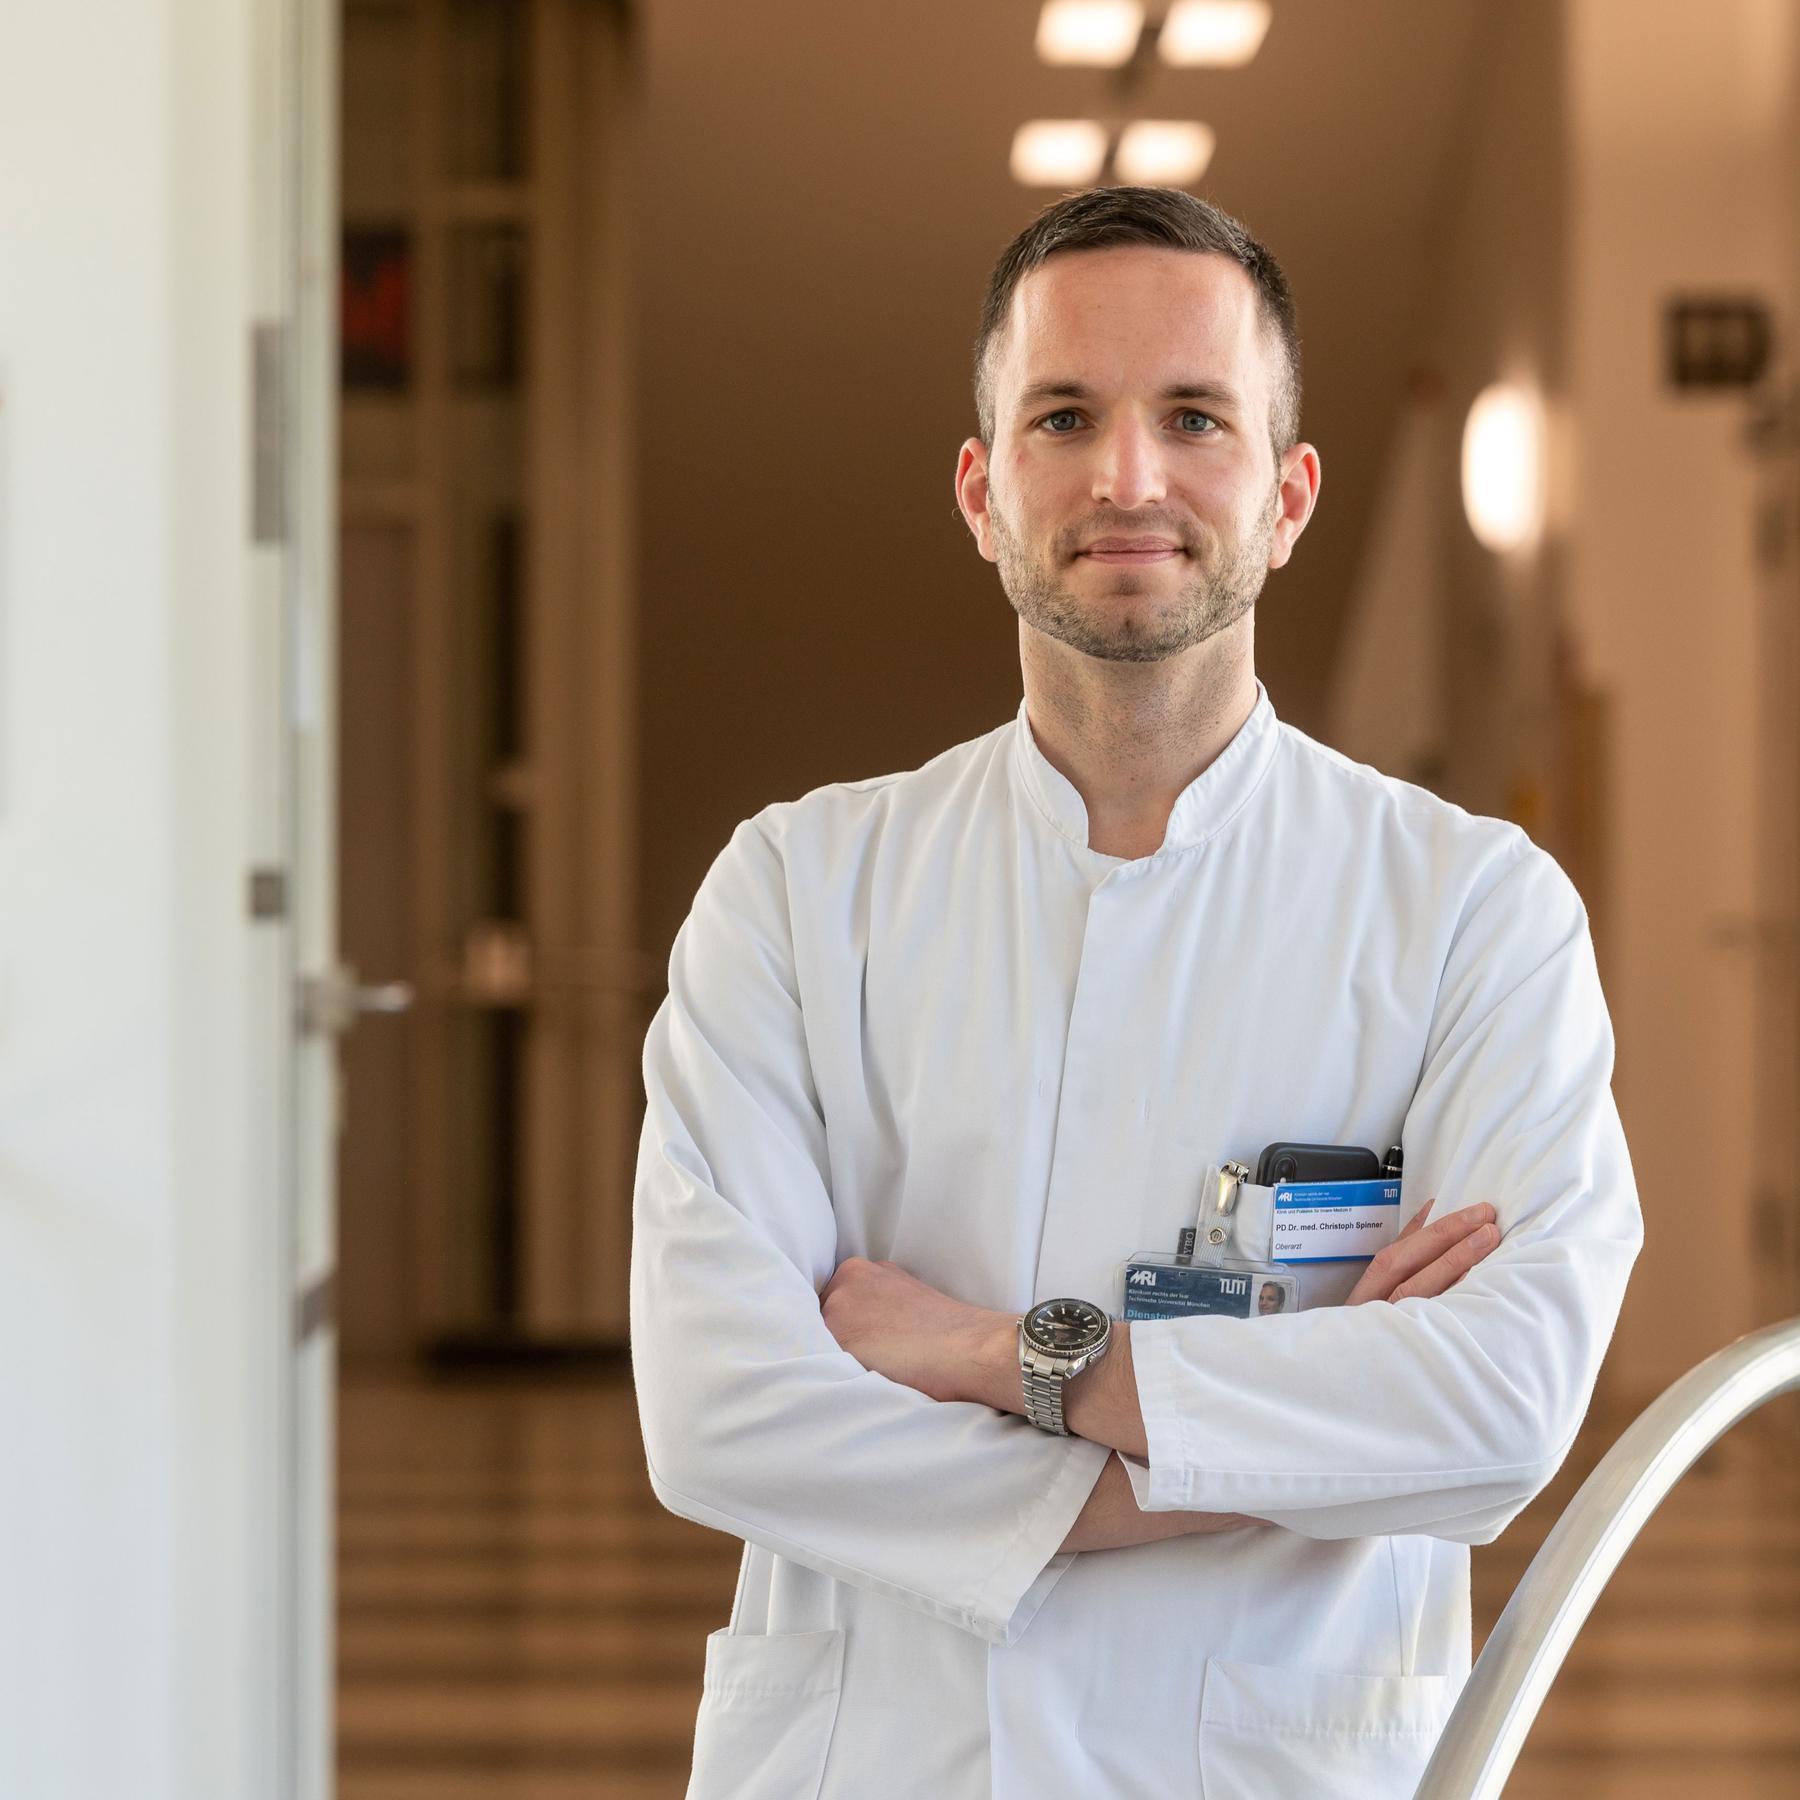 Corona-News mit Dr. Christoph Spinner (19.10.2021)